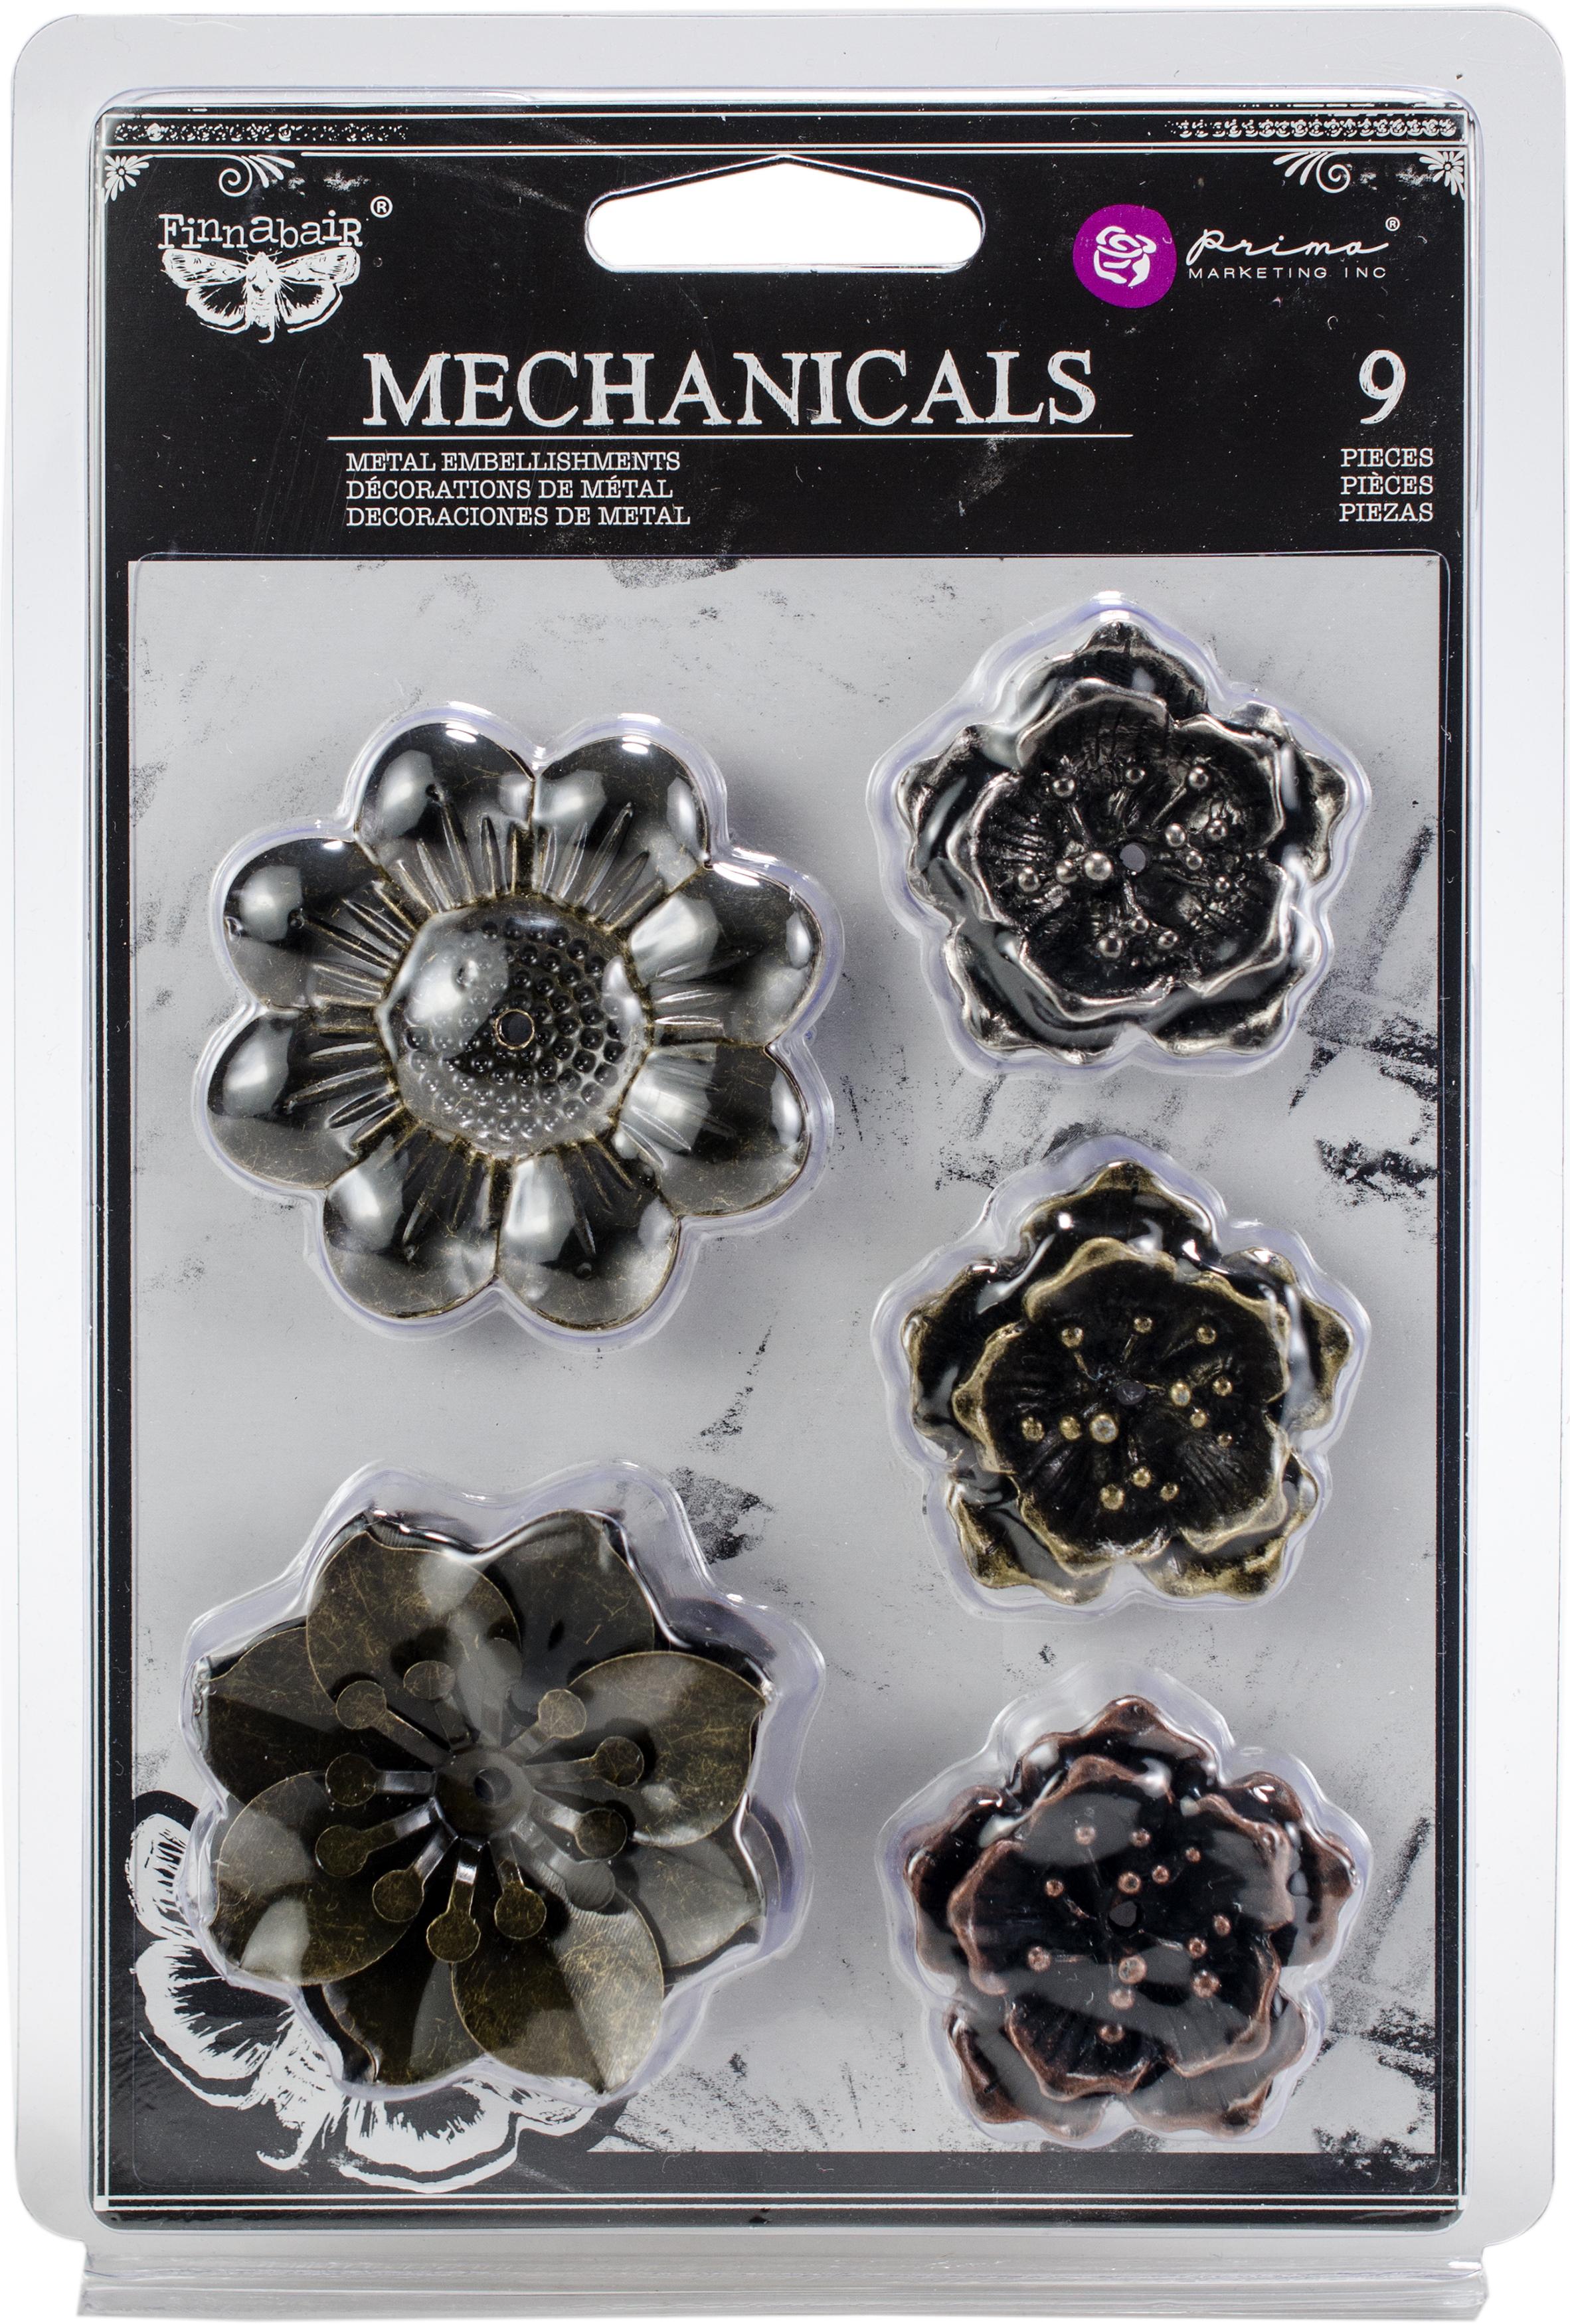 Mechanicals Metal Embellishment